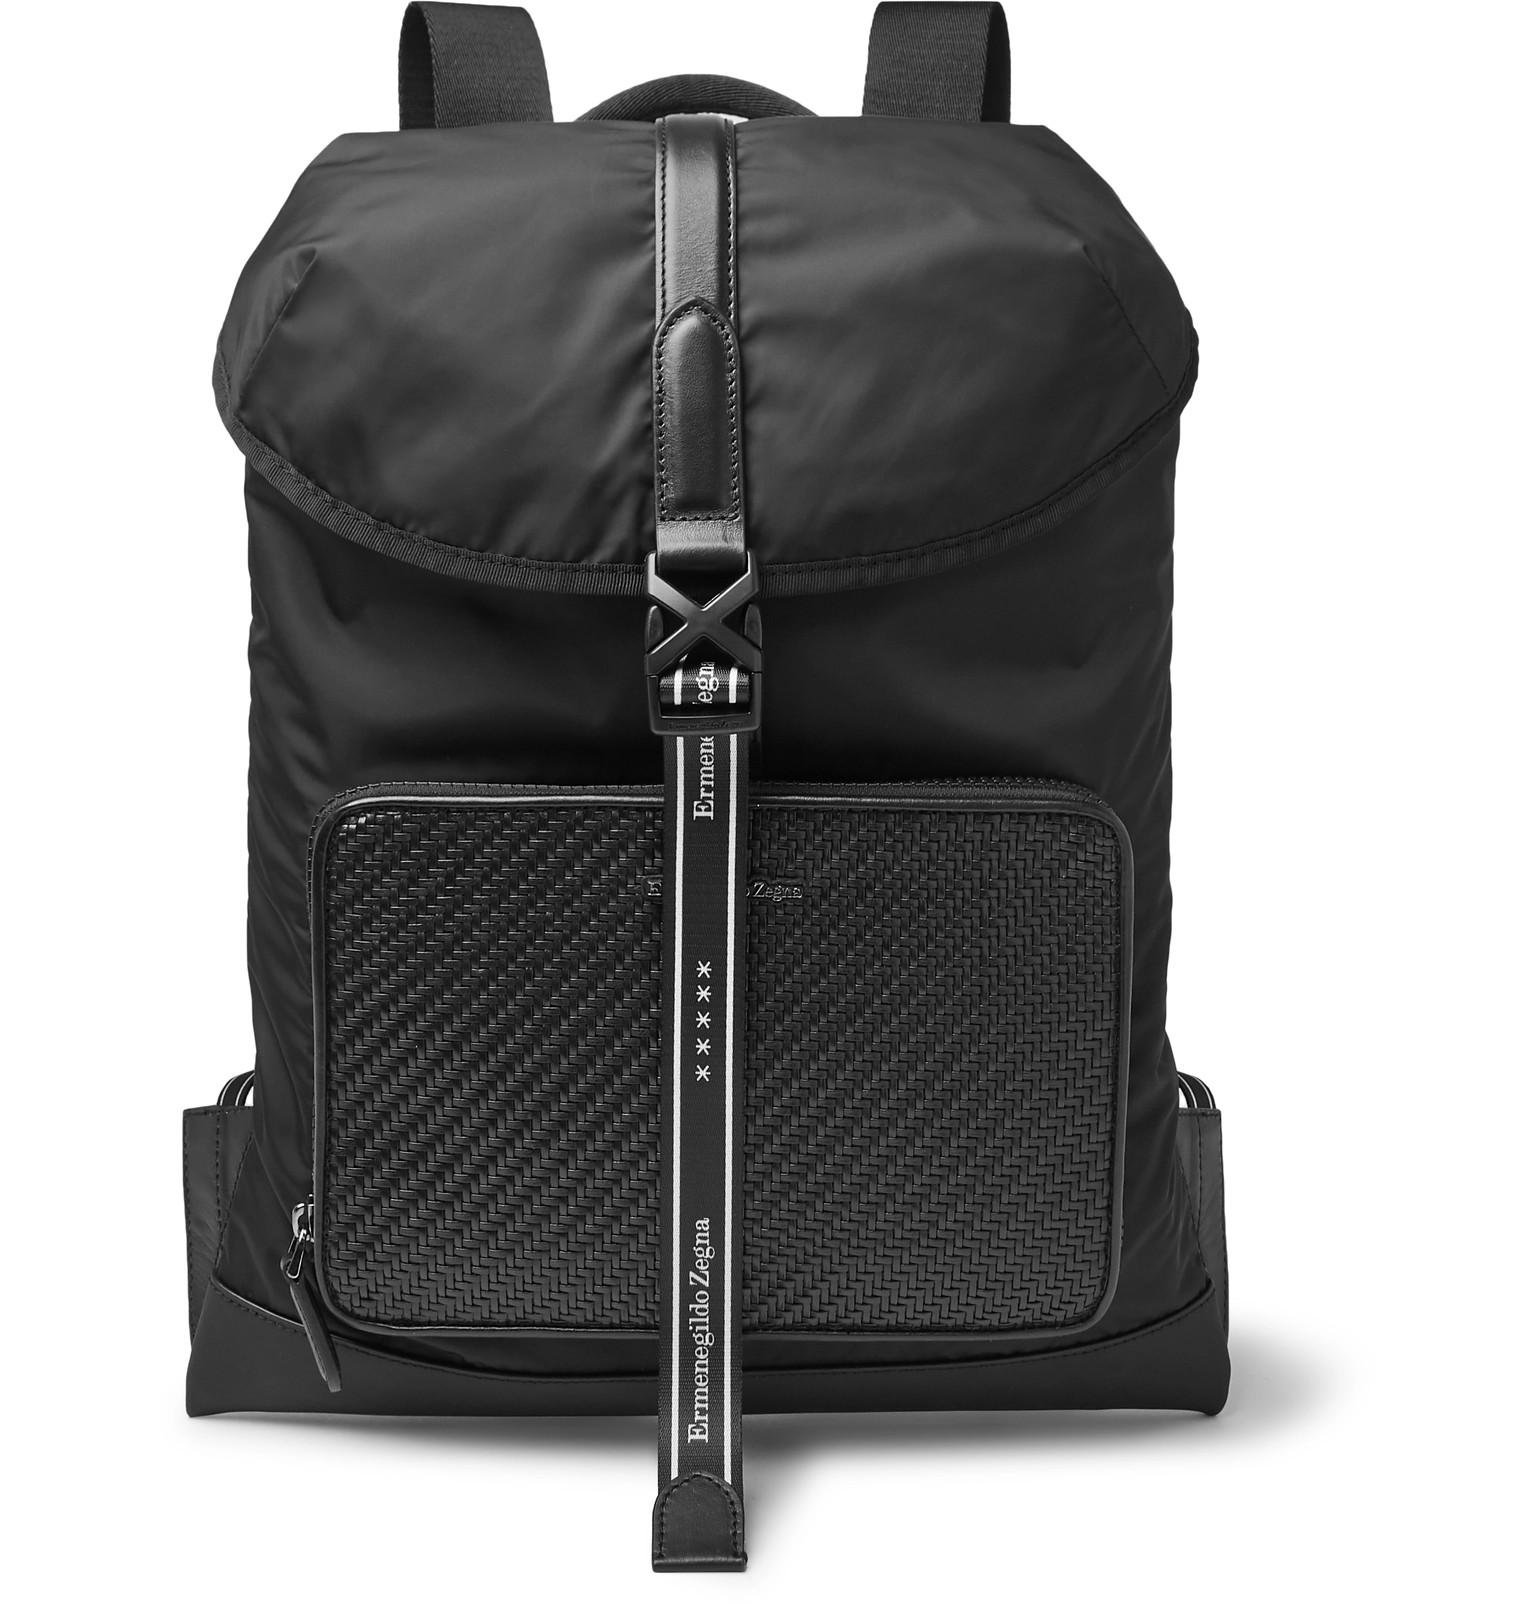 5a3759a27c Ermenegildo Zegna - Pelle Tessuta Leather and Nylon Backpack